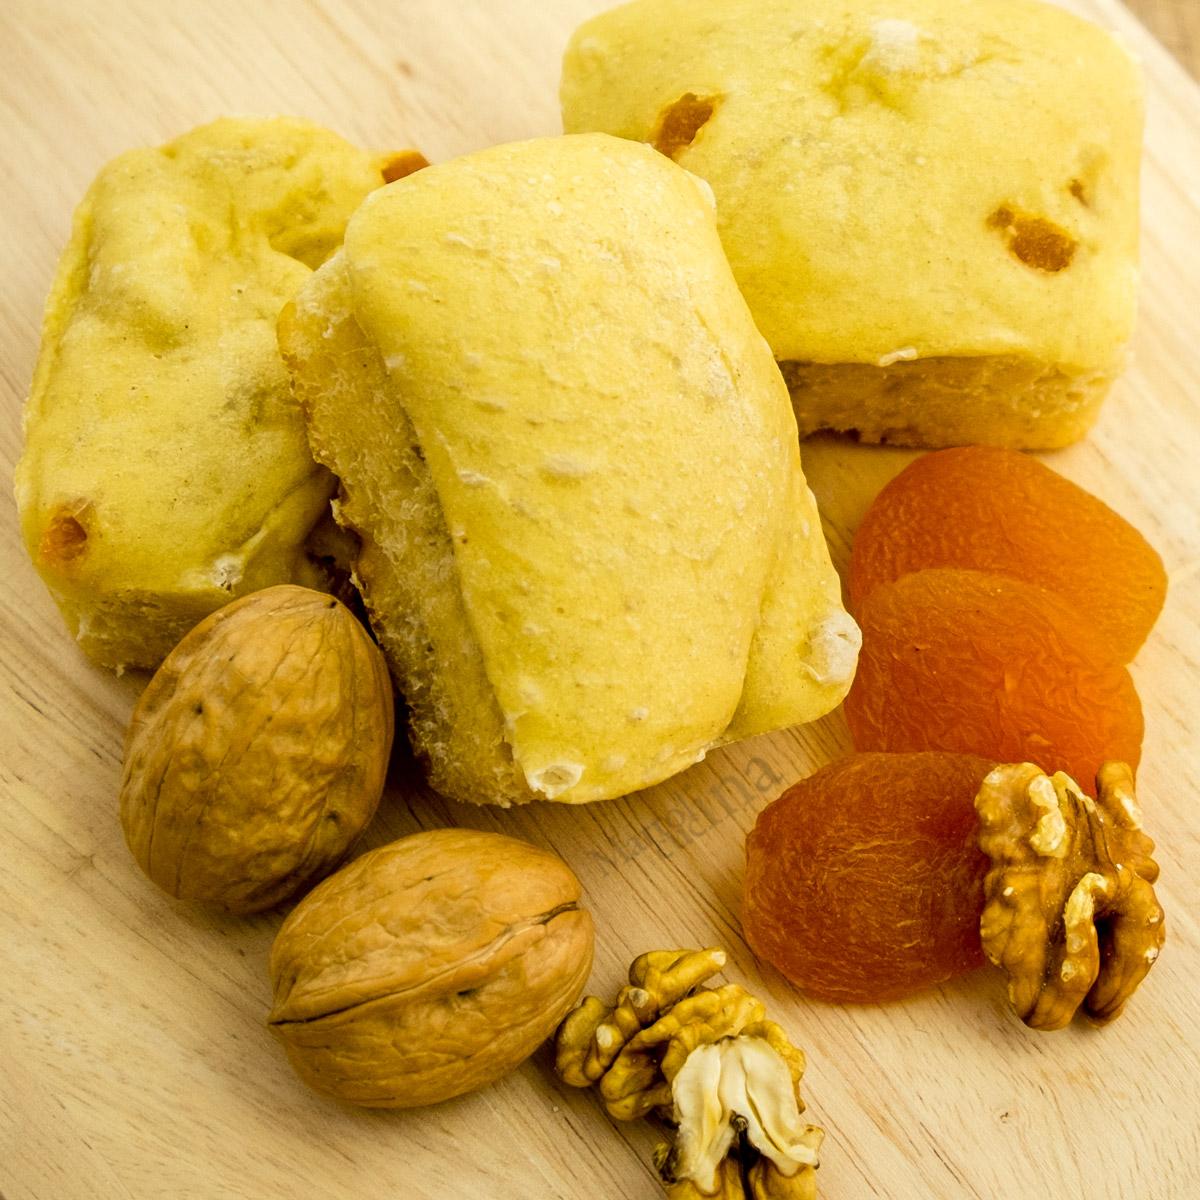 Plumcake di pane con noci e albicocche